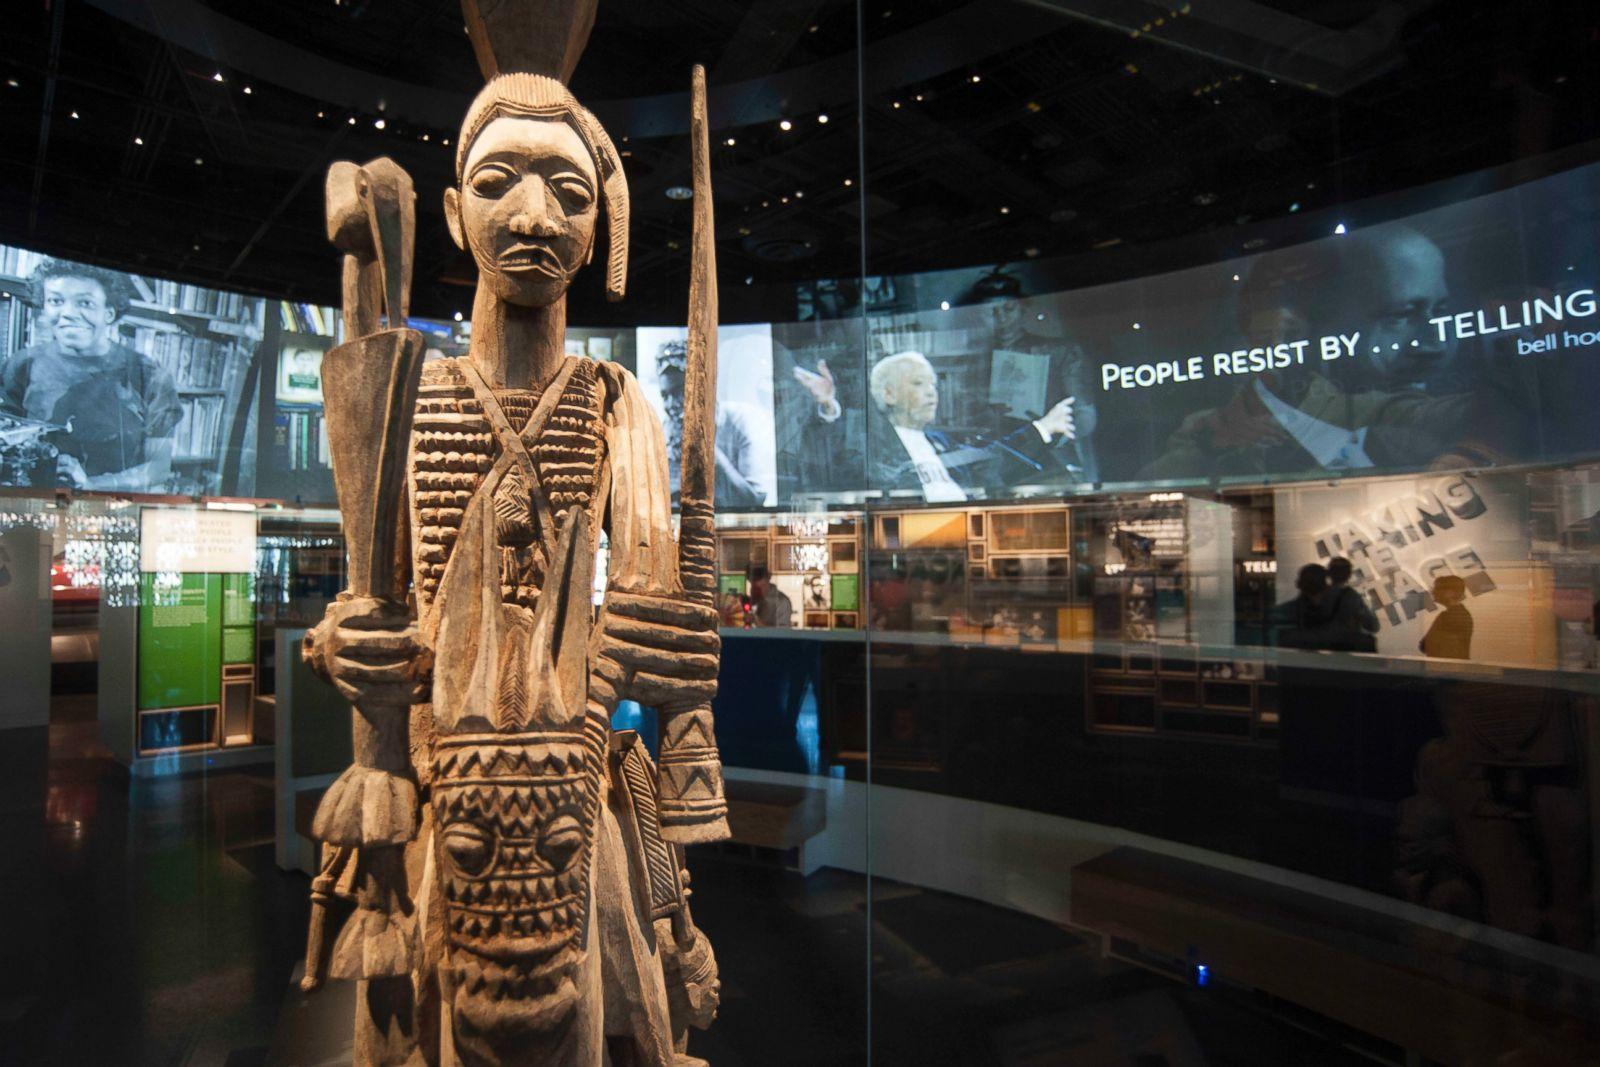 GTY_Smithsonian_Natl_Museum_African_American_History_Culture5_MEM_160915_3x2_1600.jpg